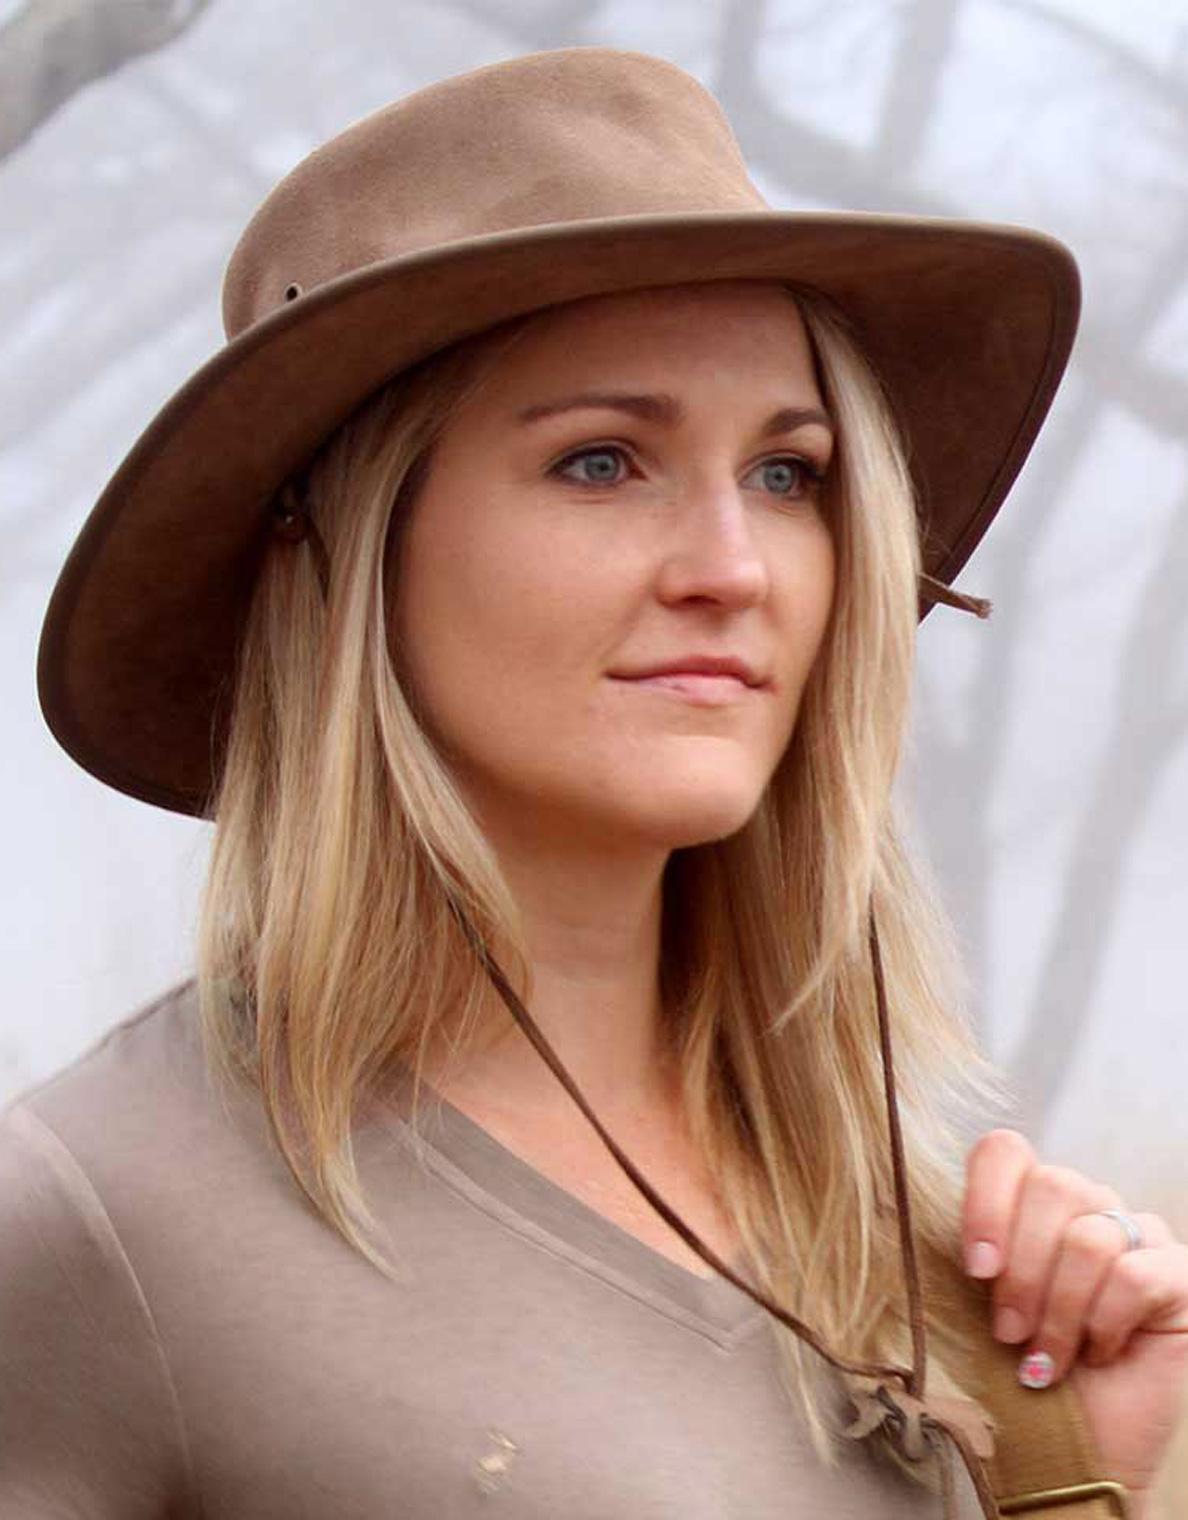 Women's leather safari hat in Khaki. Get safari hat sun protection for travel, outdoor, & safari